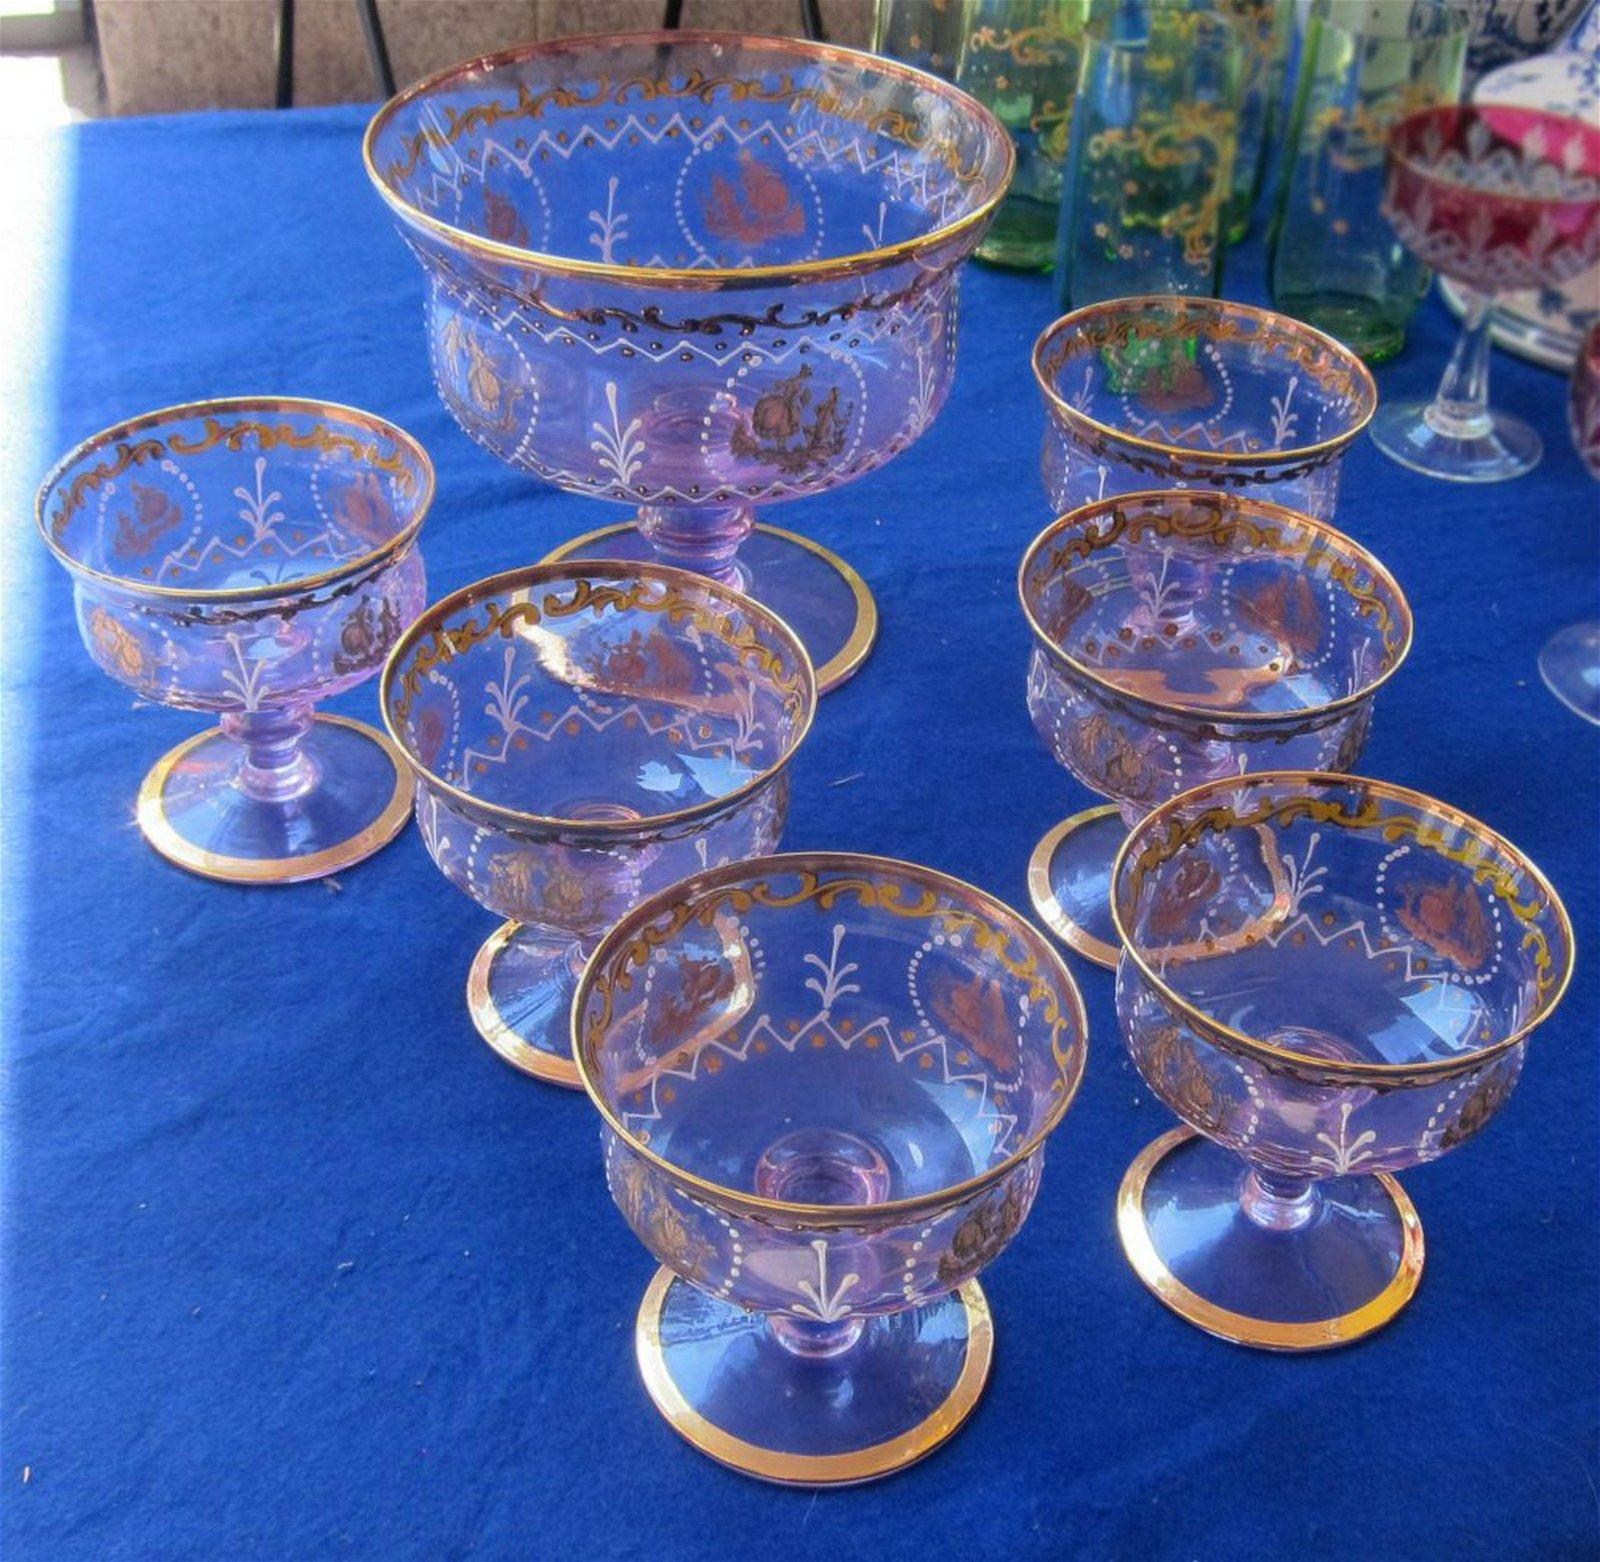 Italian 7-piece glass service